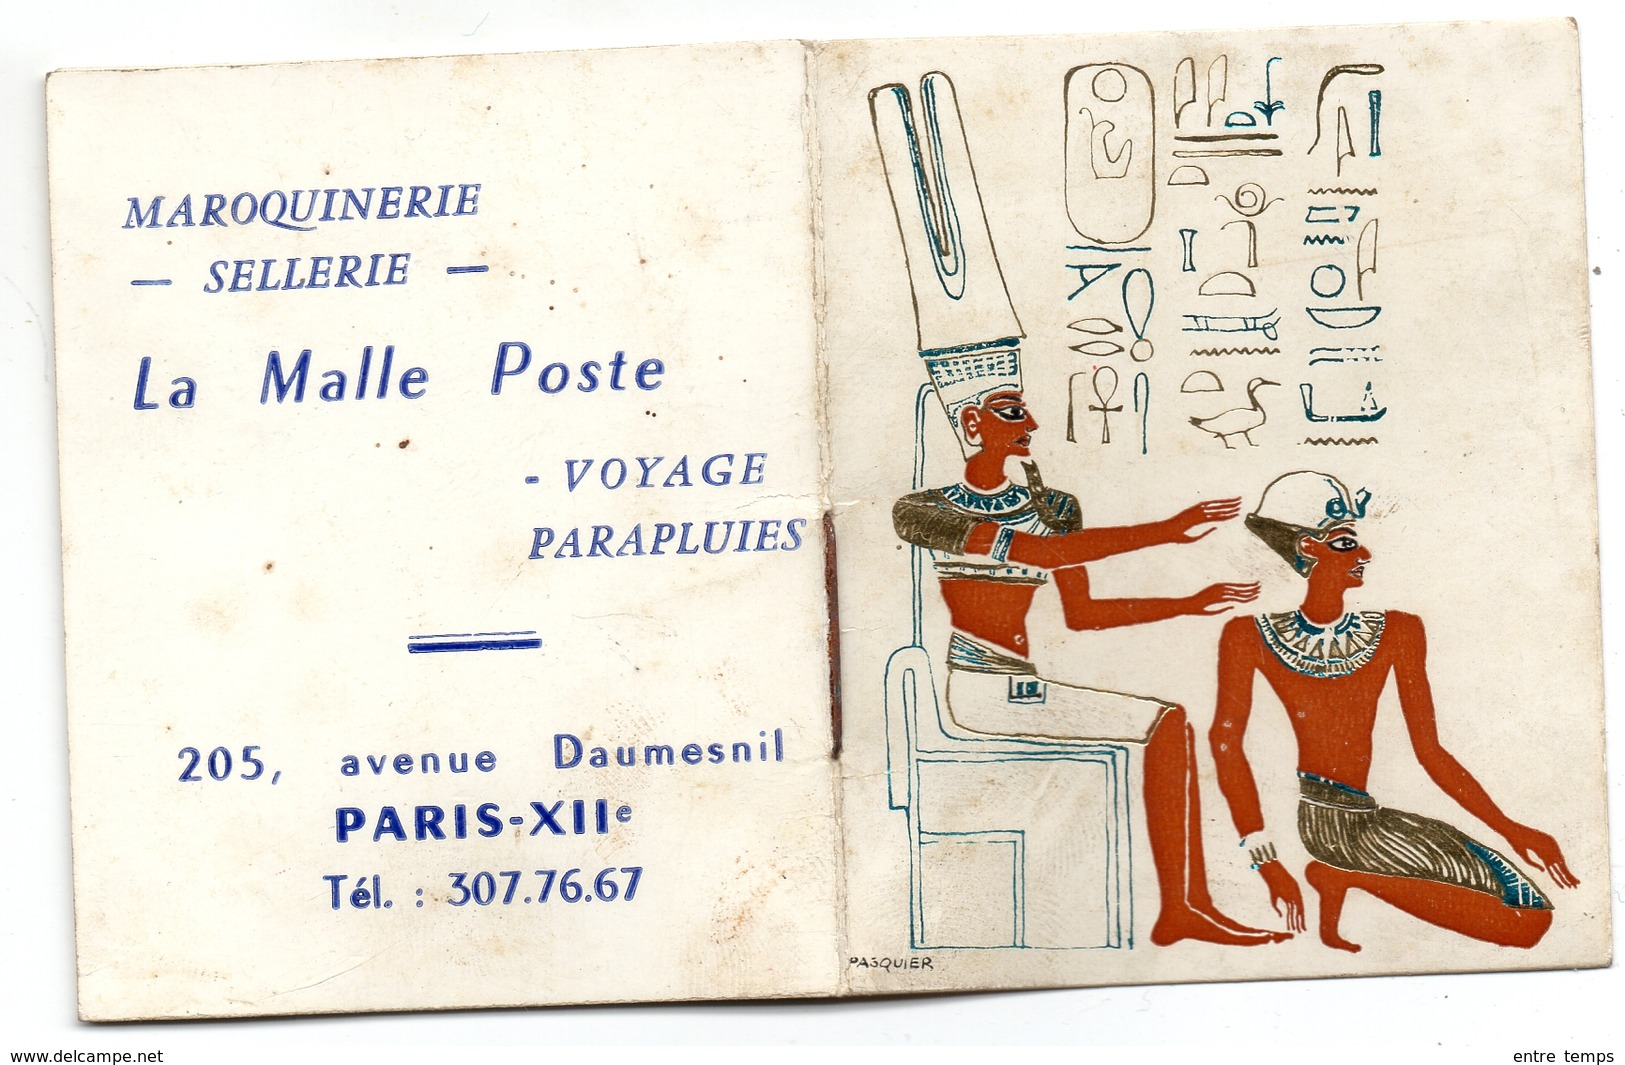 Calendrier Poche Paris 12 ème La Malle Poste Maroquinerie Avenue Daumesnil - Calendriers